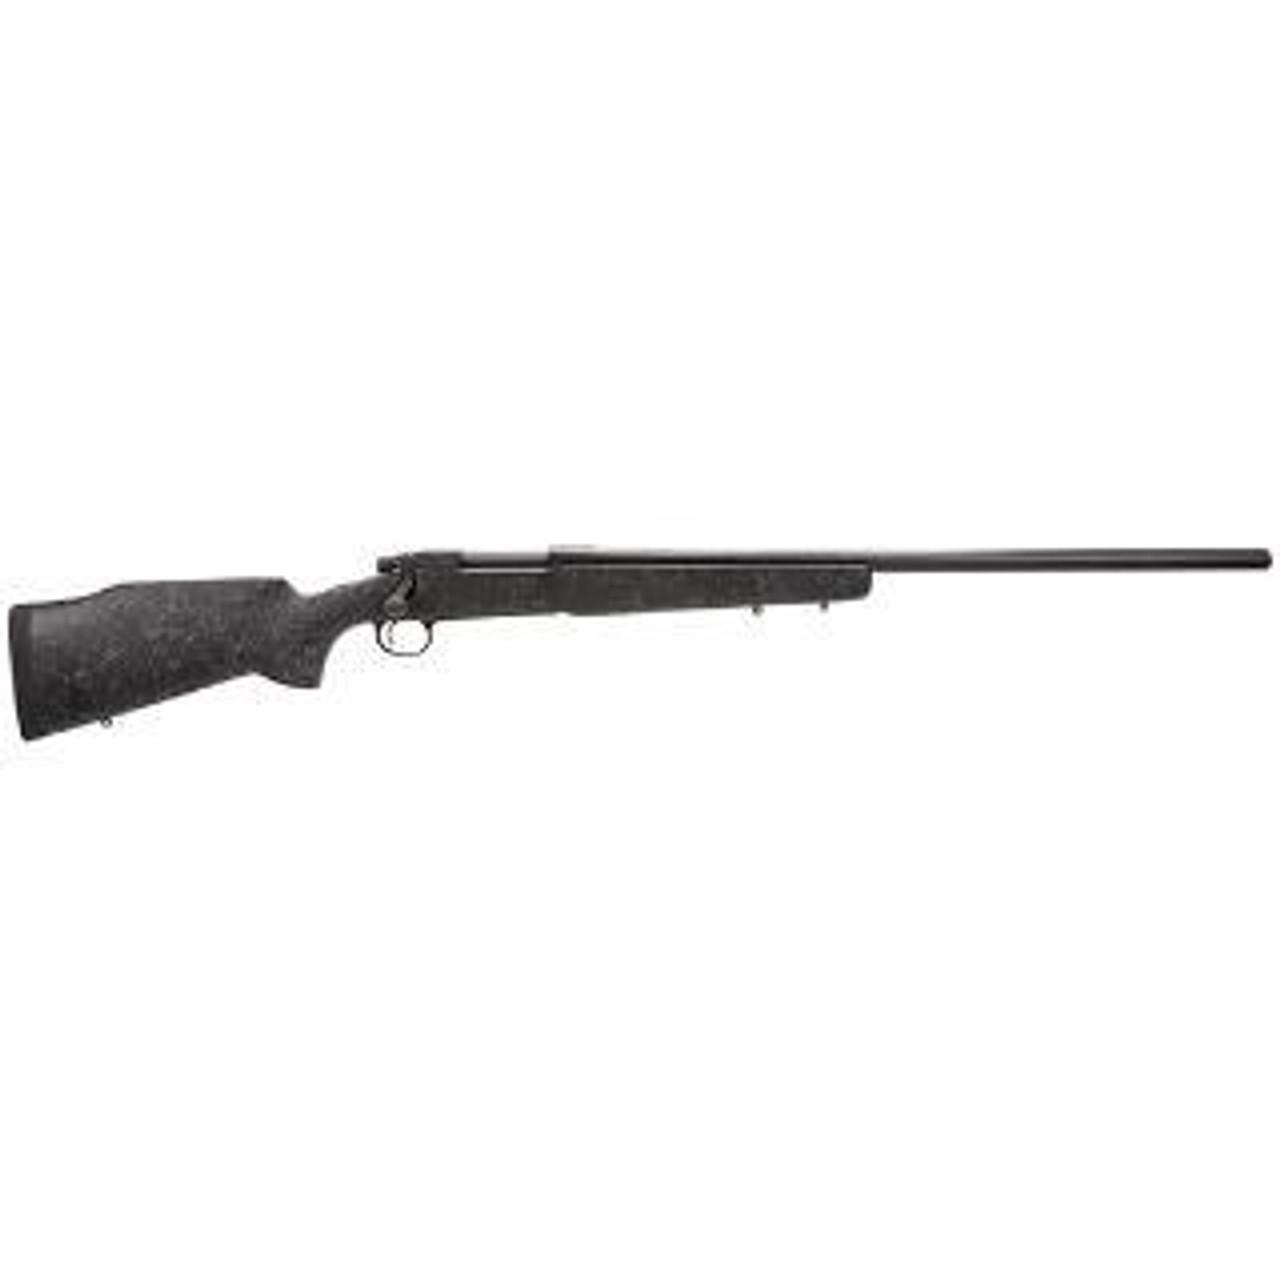 Remington 700 LRH CALIFORNIA LEGAL .300Winmag